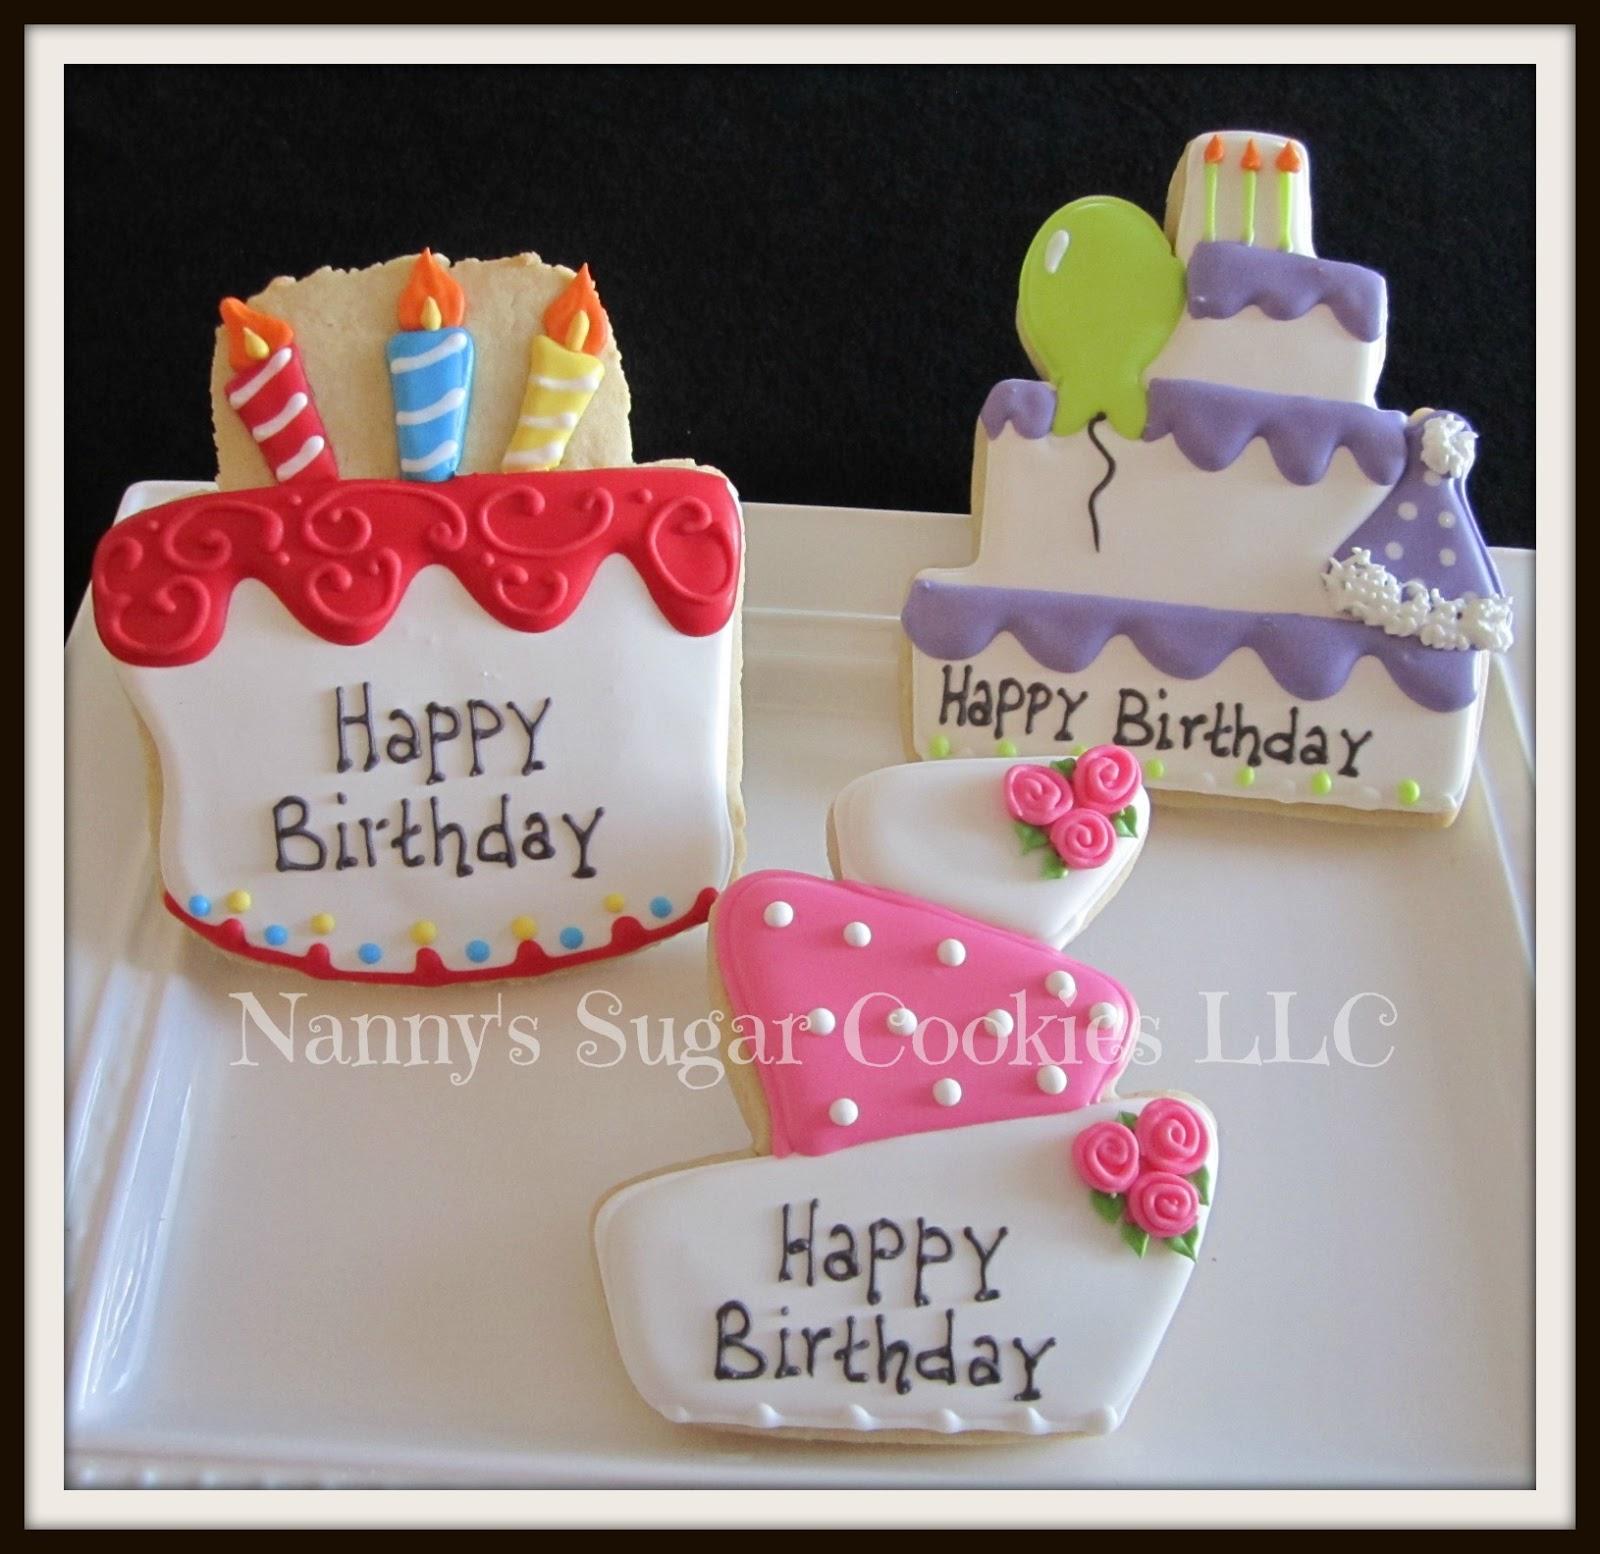 Nanny's Sugar Cookies LLC: Birthday Cookie Favors